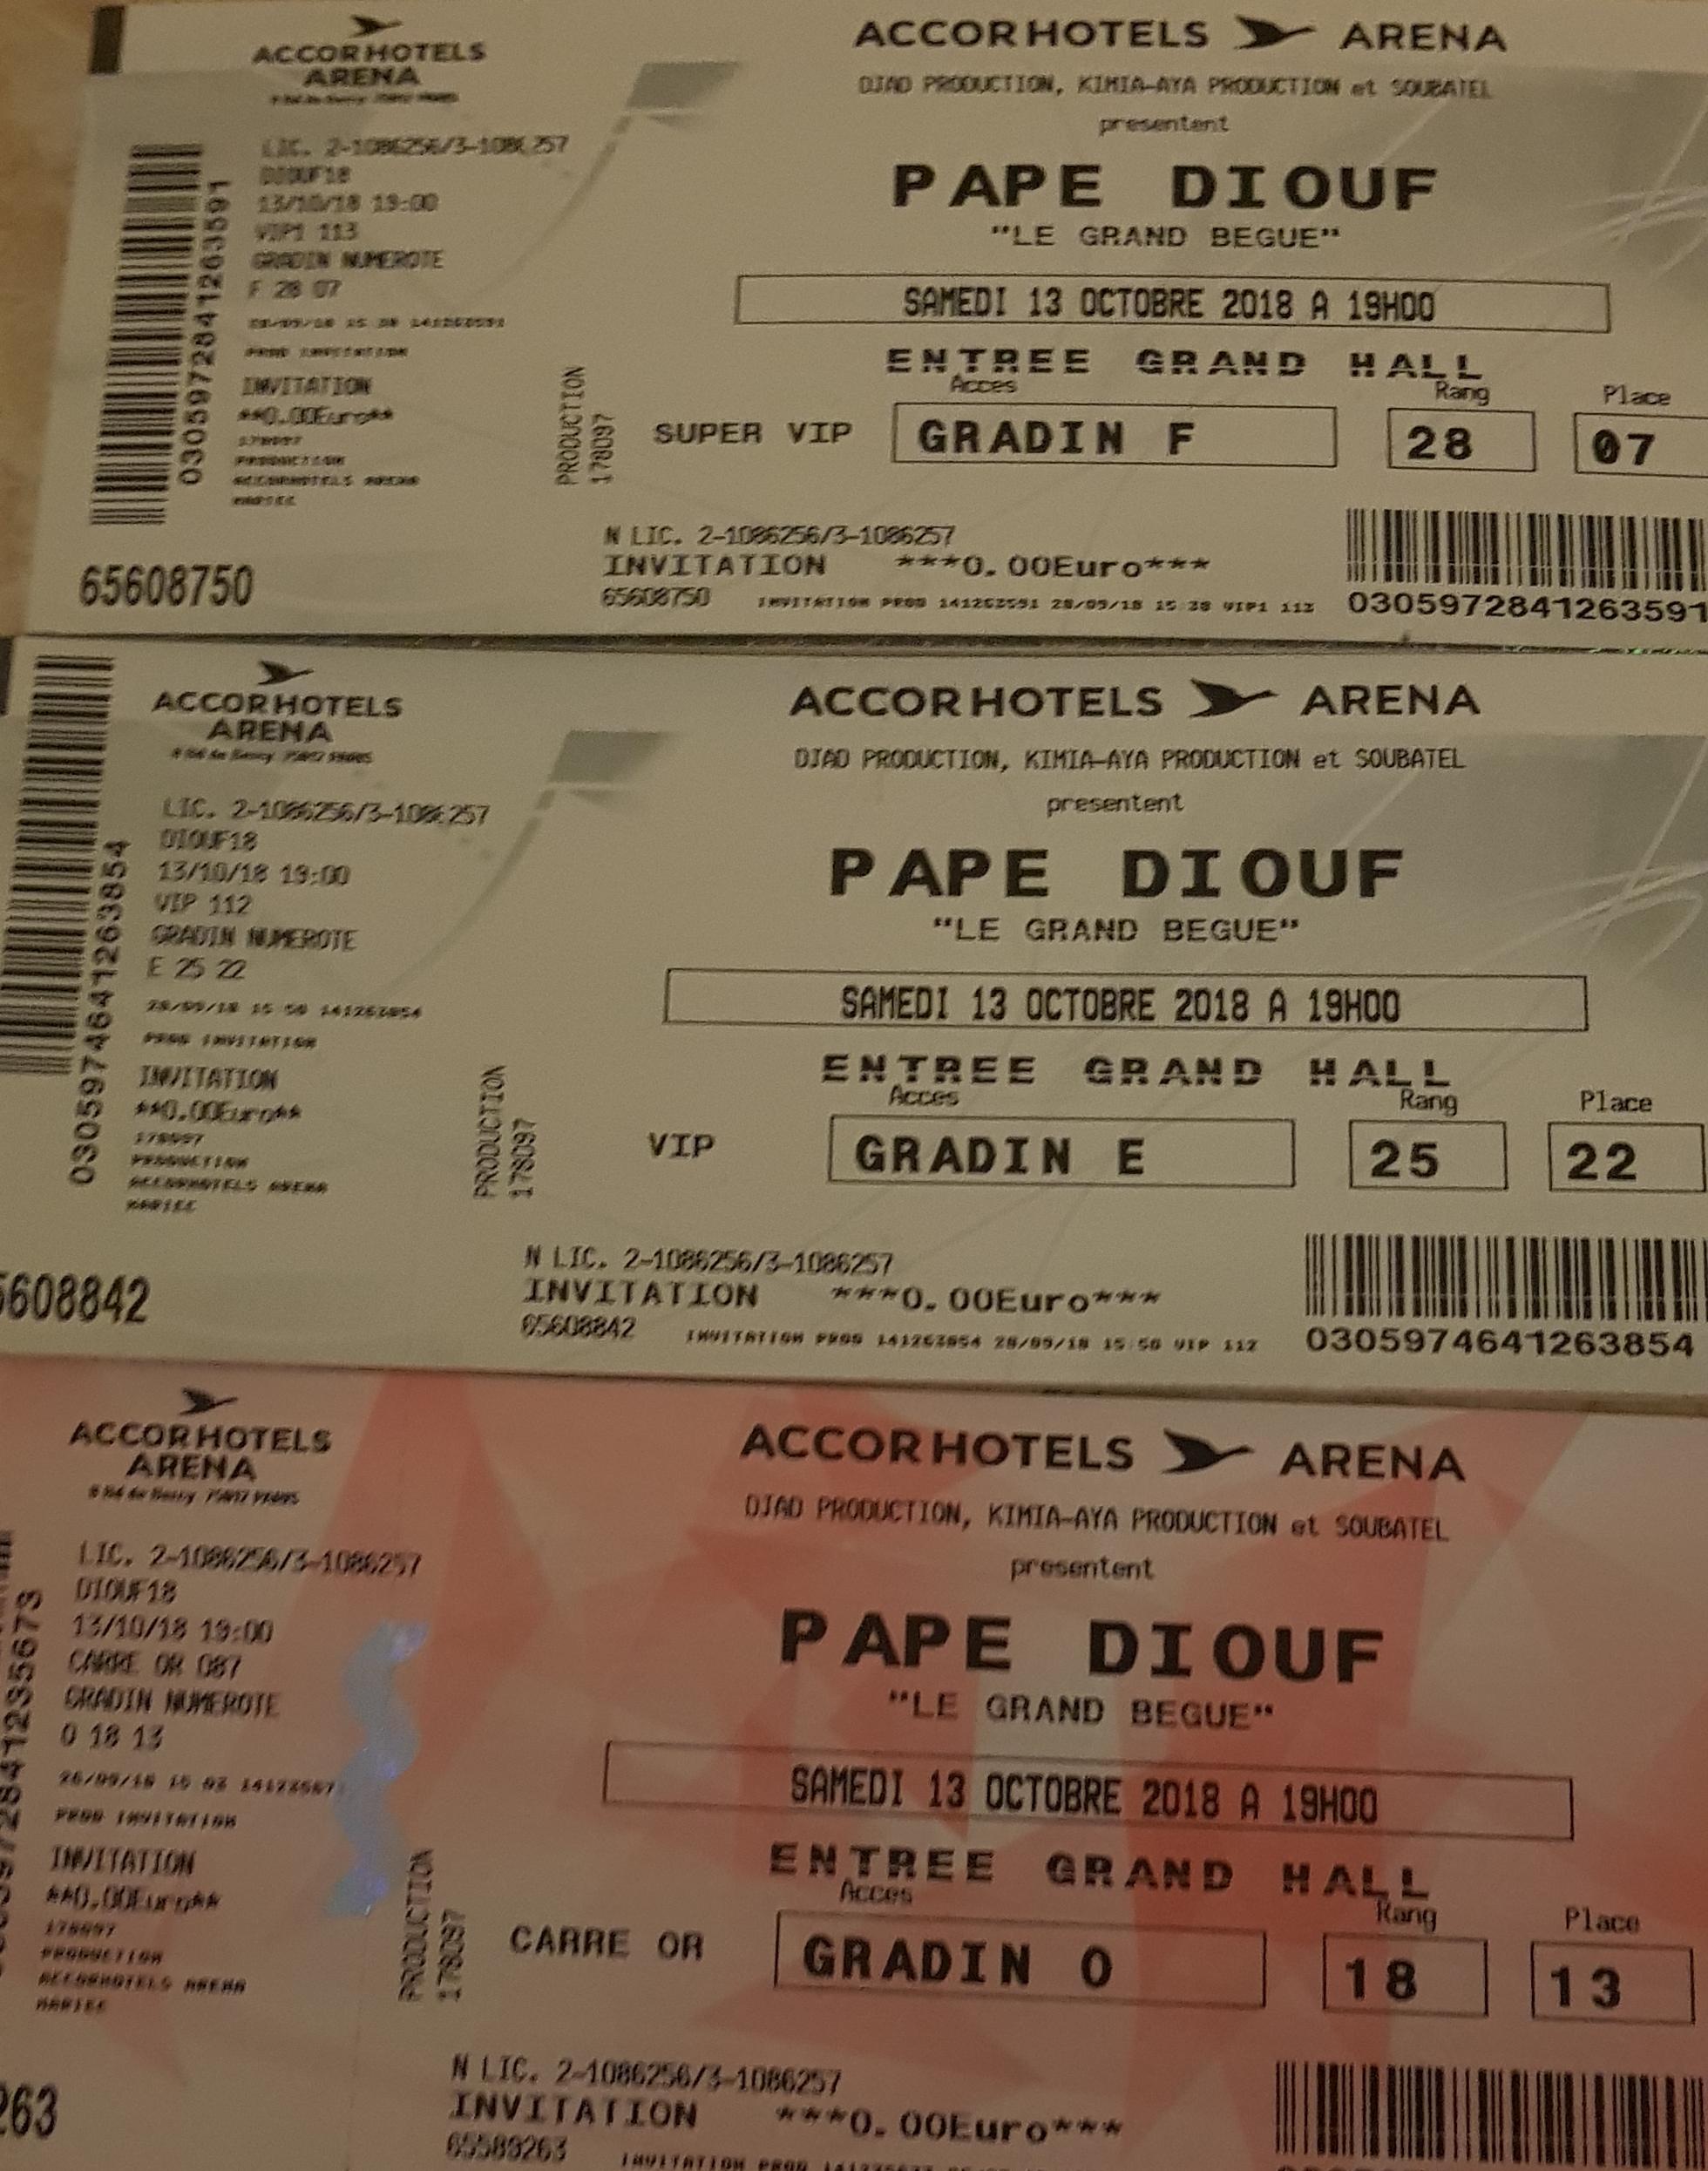 BERCYDE PAPE DIOUF: Les tickets SUPER VIP 200 EUROS, VIP 150 EUROS ET CARREE OR 60 EUROS appelez le 0752508807